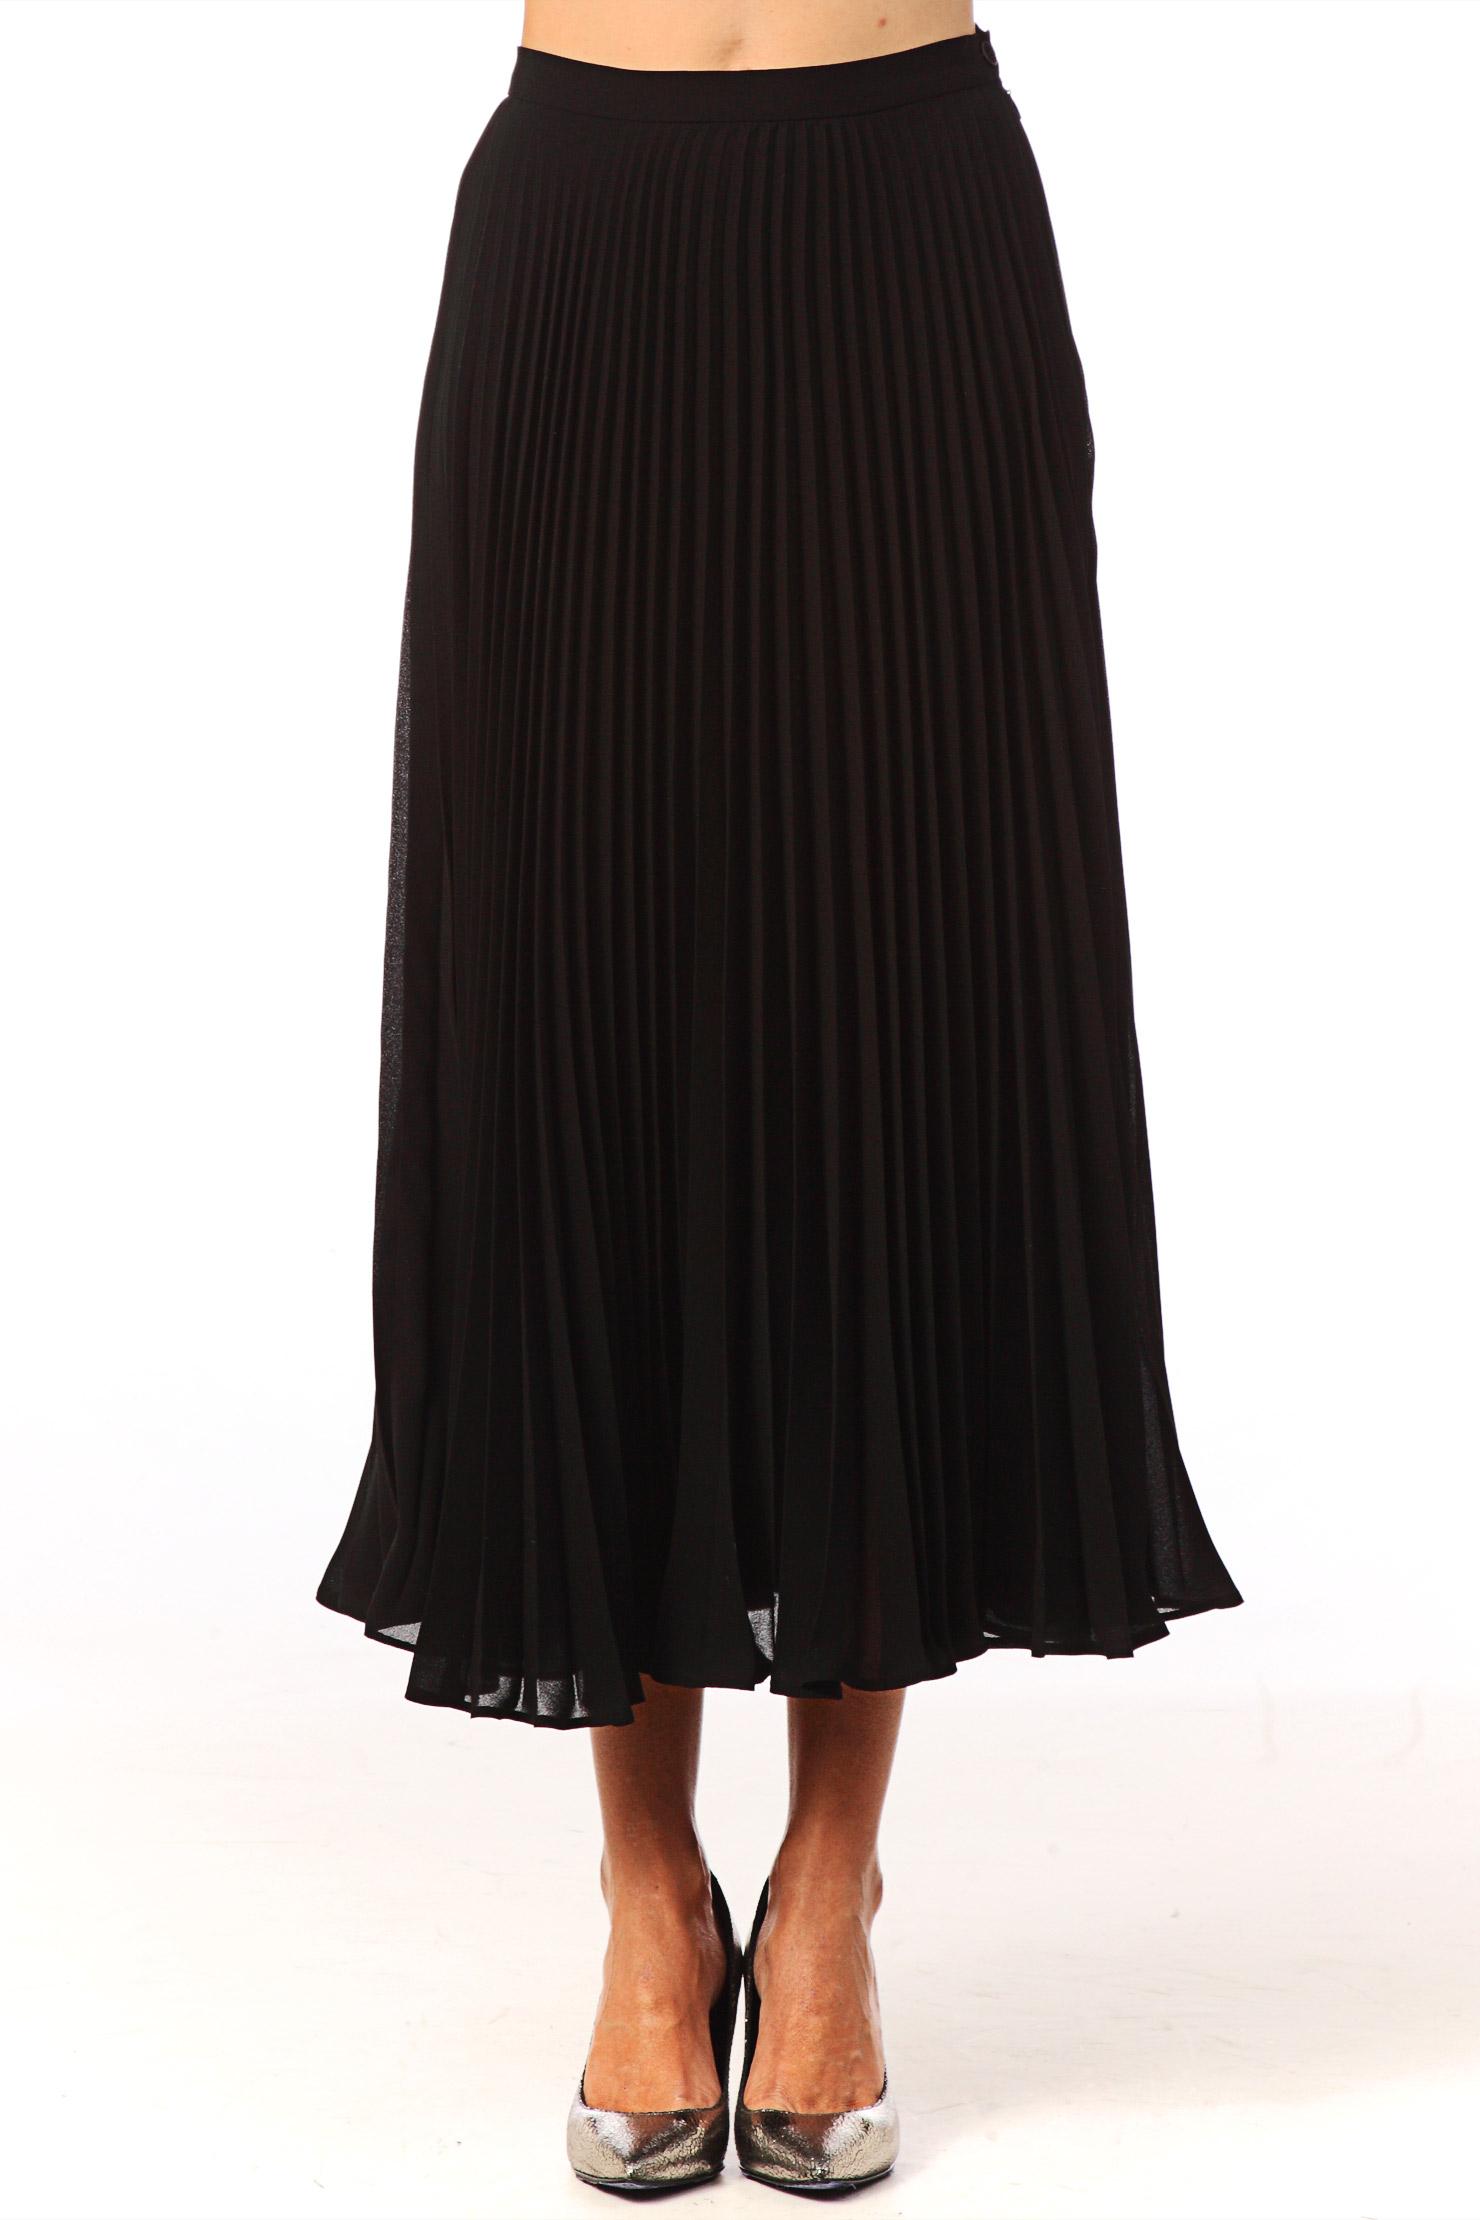 tara jarmon midi skirt maxi skirt 9364 j1130 in black